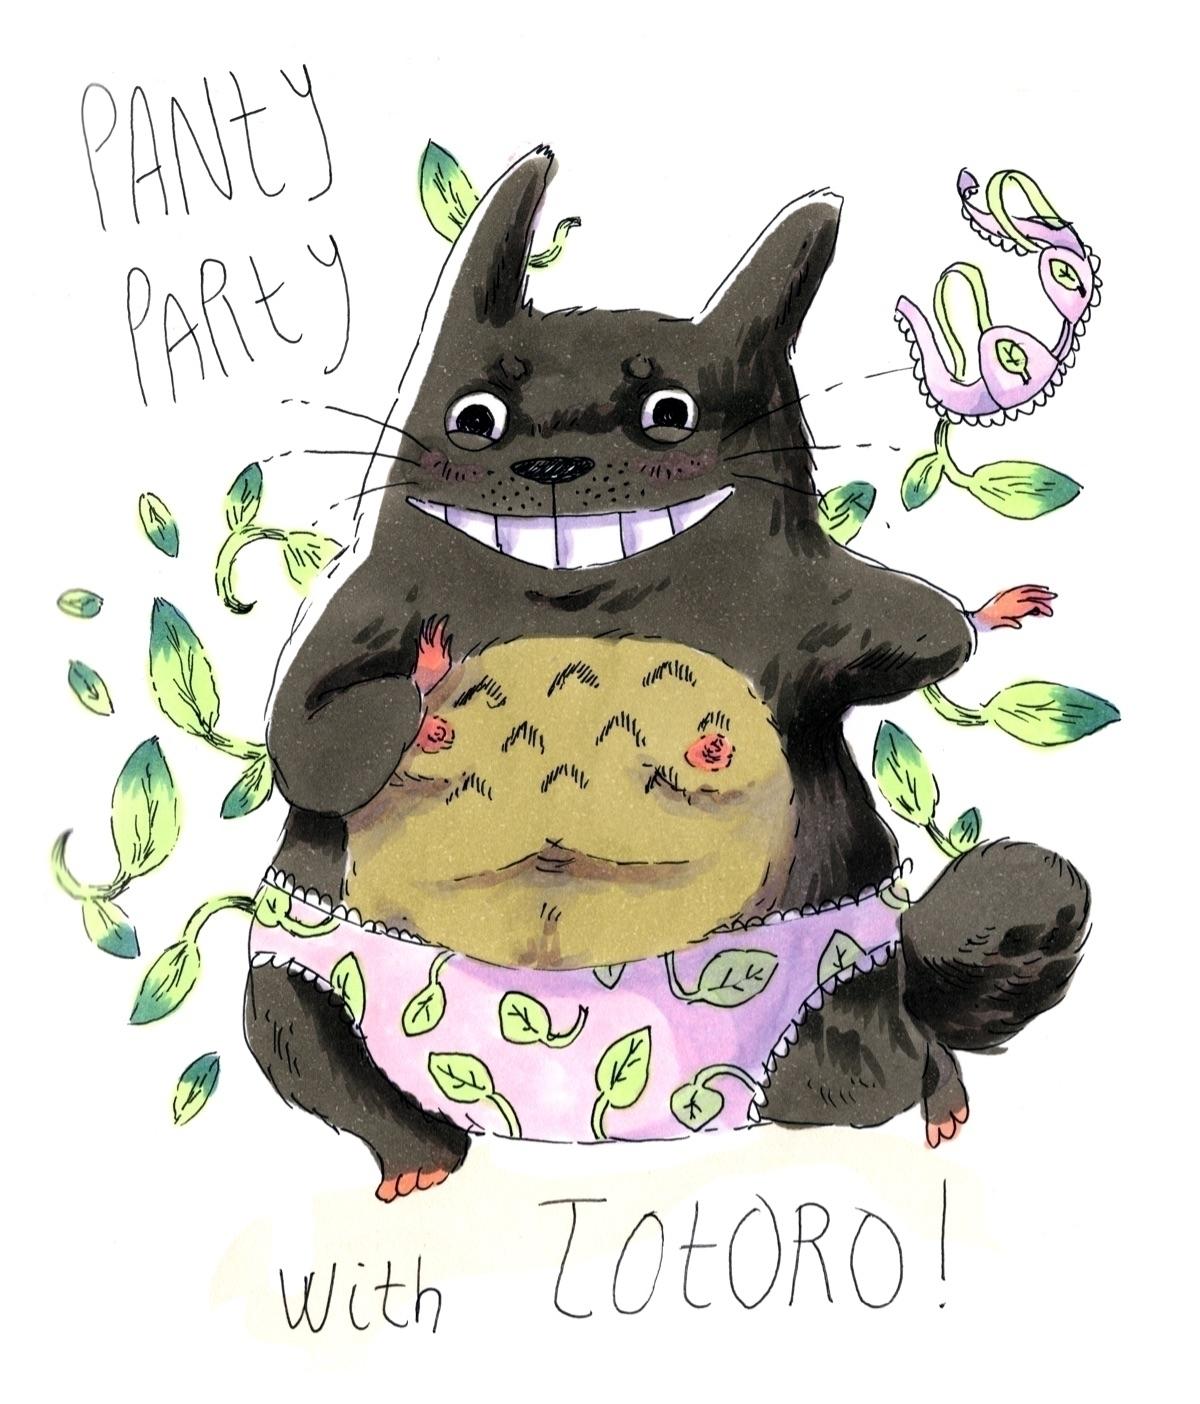 Totoro - ghibli, totoro, anime, manga - skeenep | ello